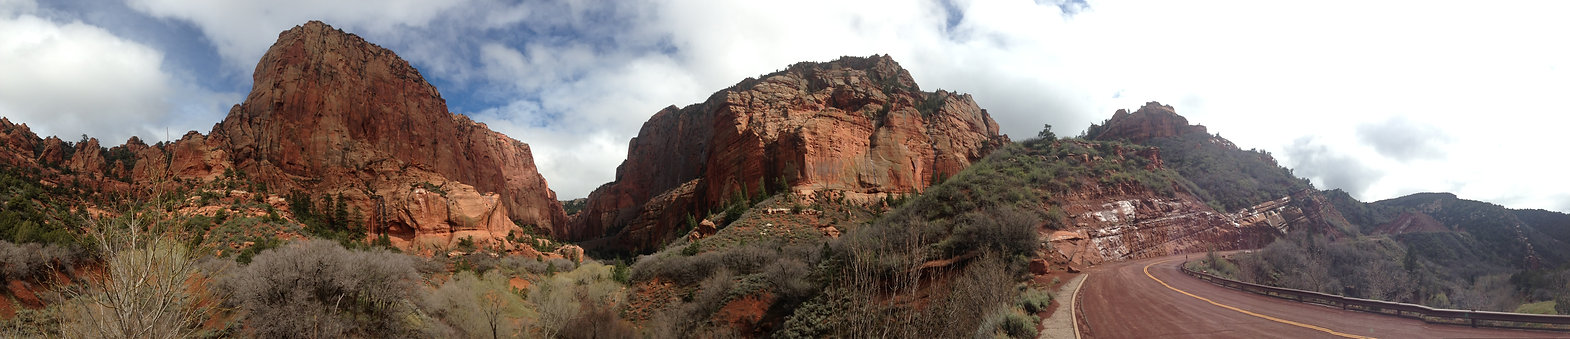 Kolob Canyon Happy Trails Adventure